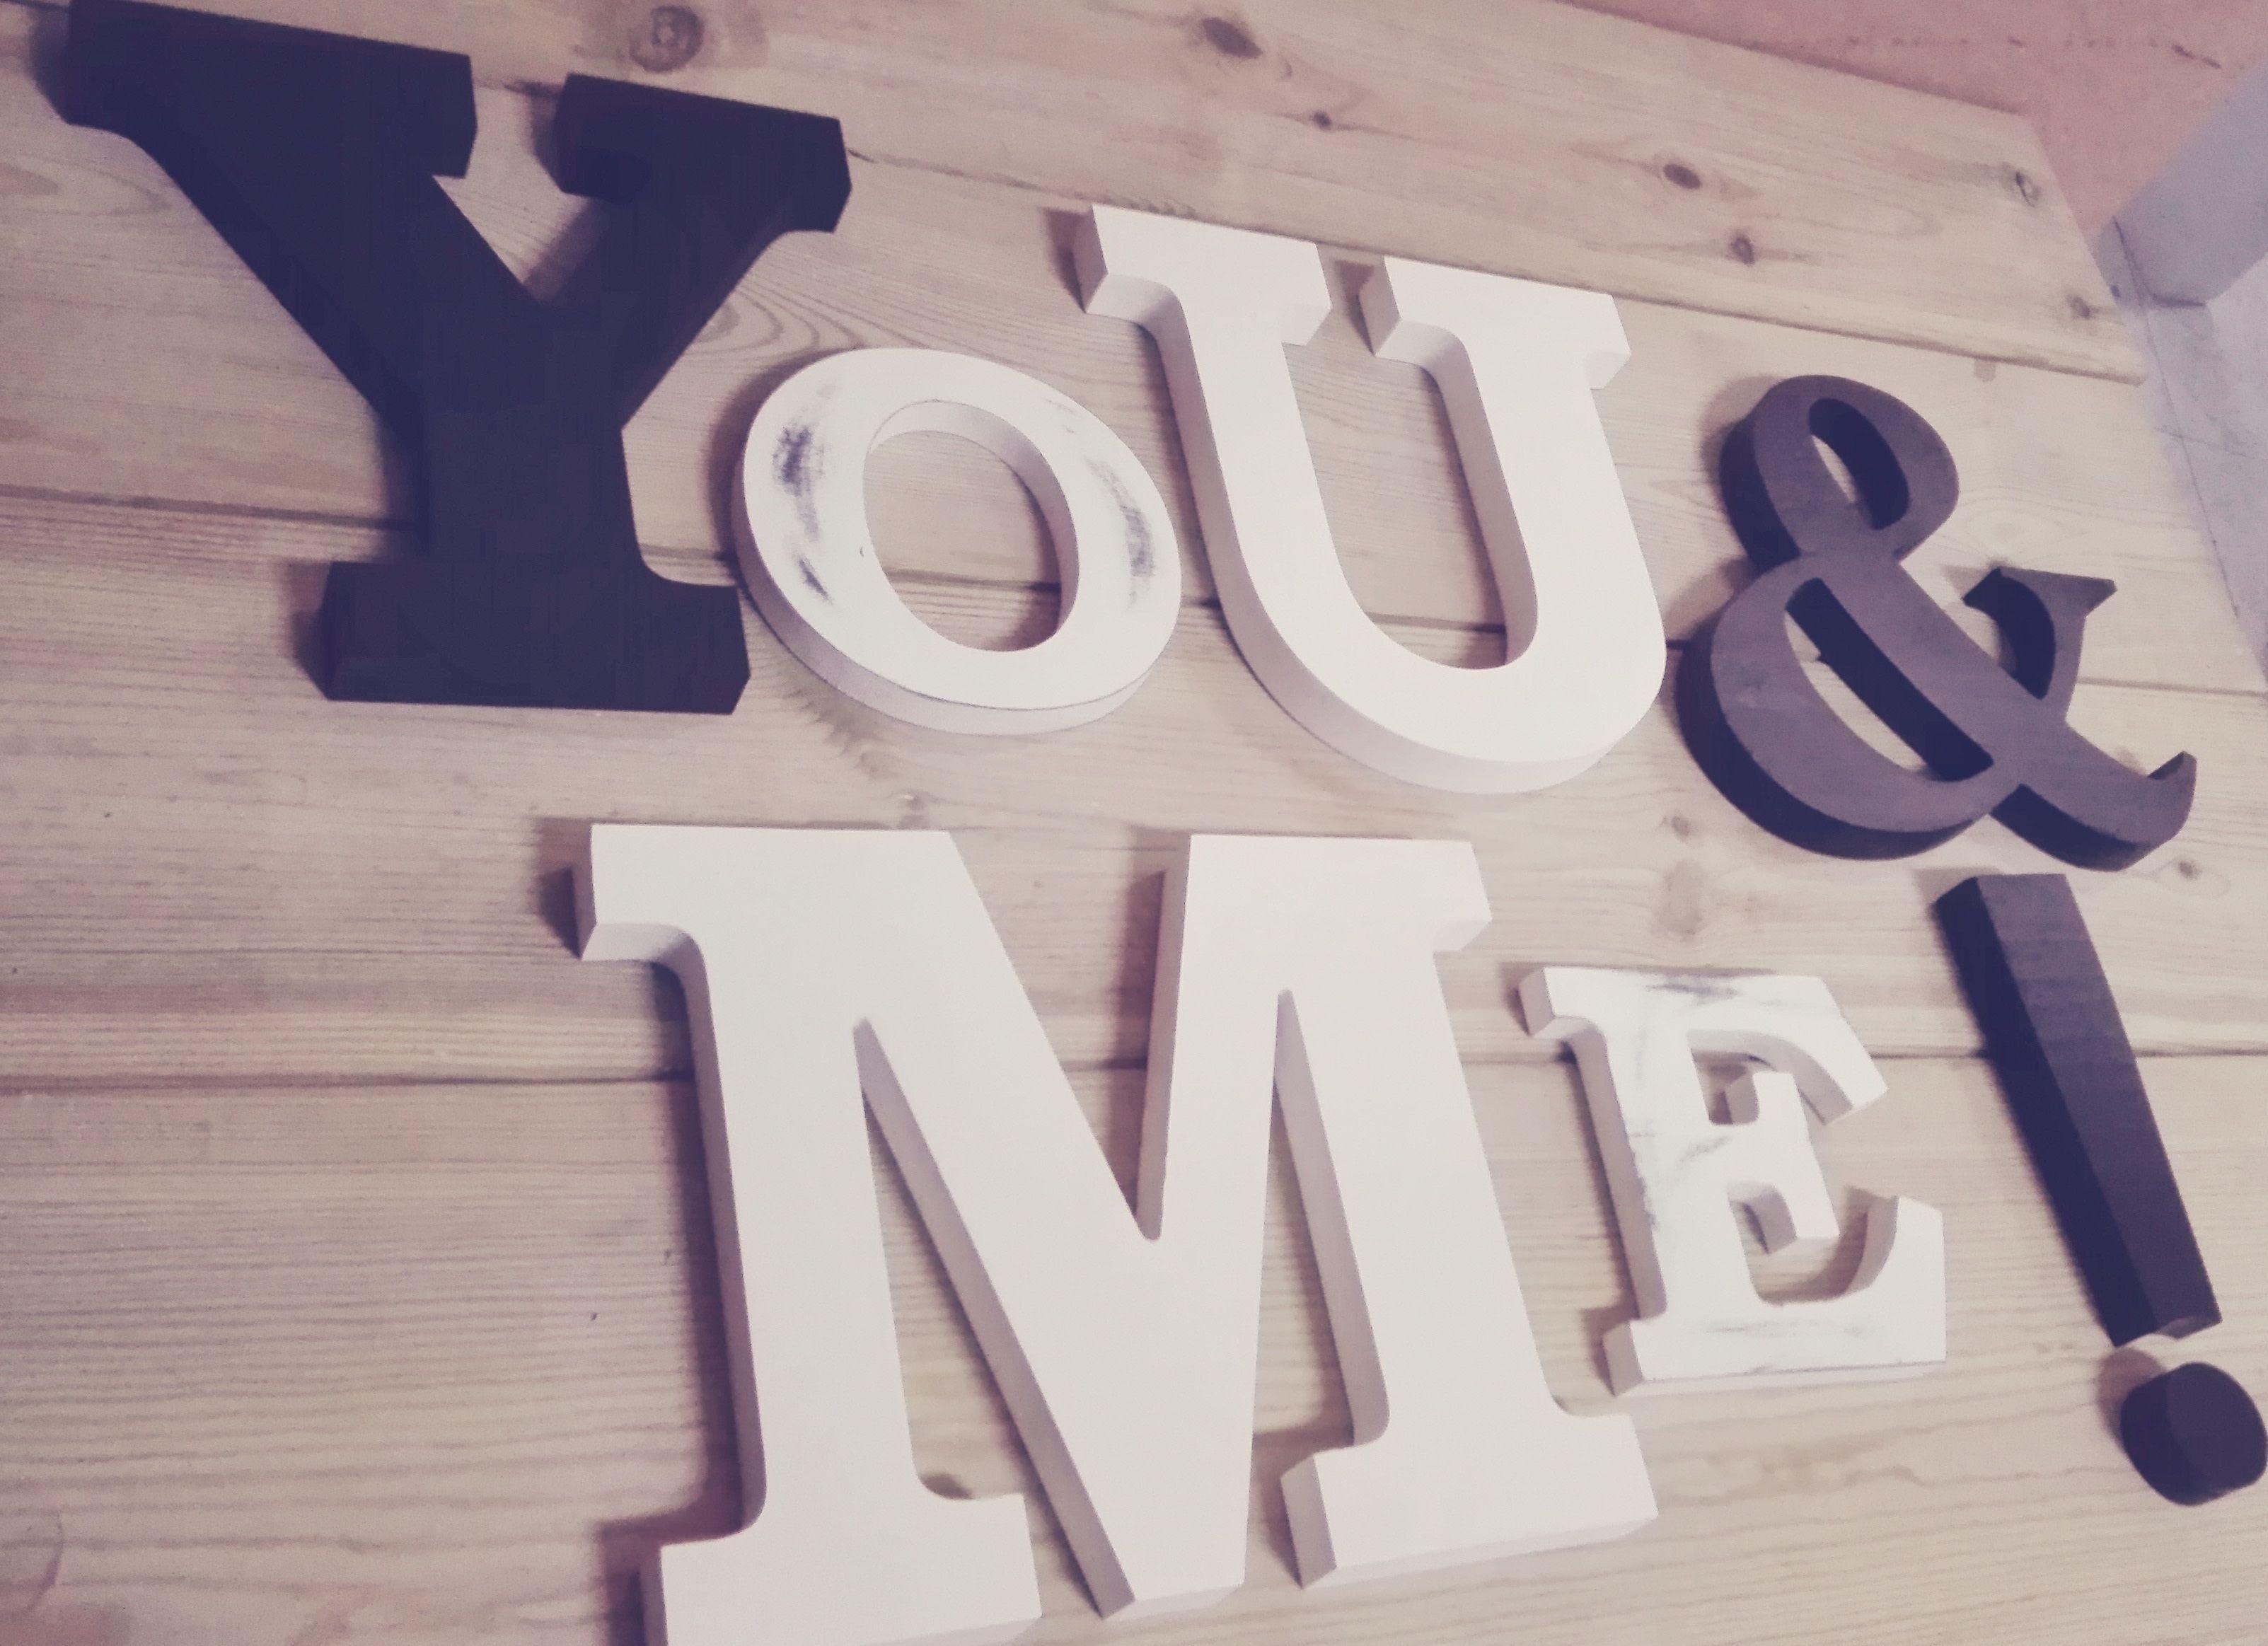 Composici n you me para decoraci n de pared - Ideas para decorar letras de madera ...